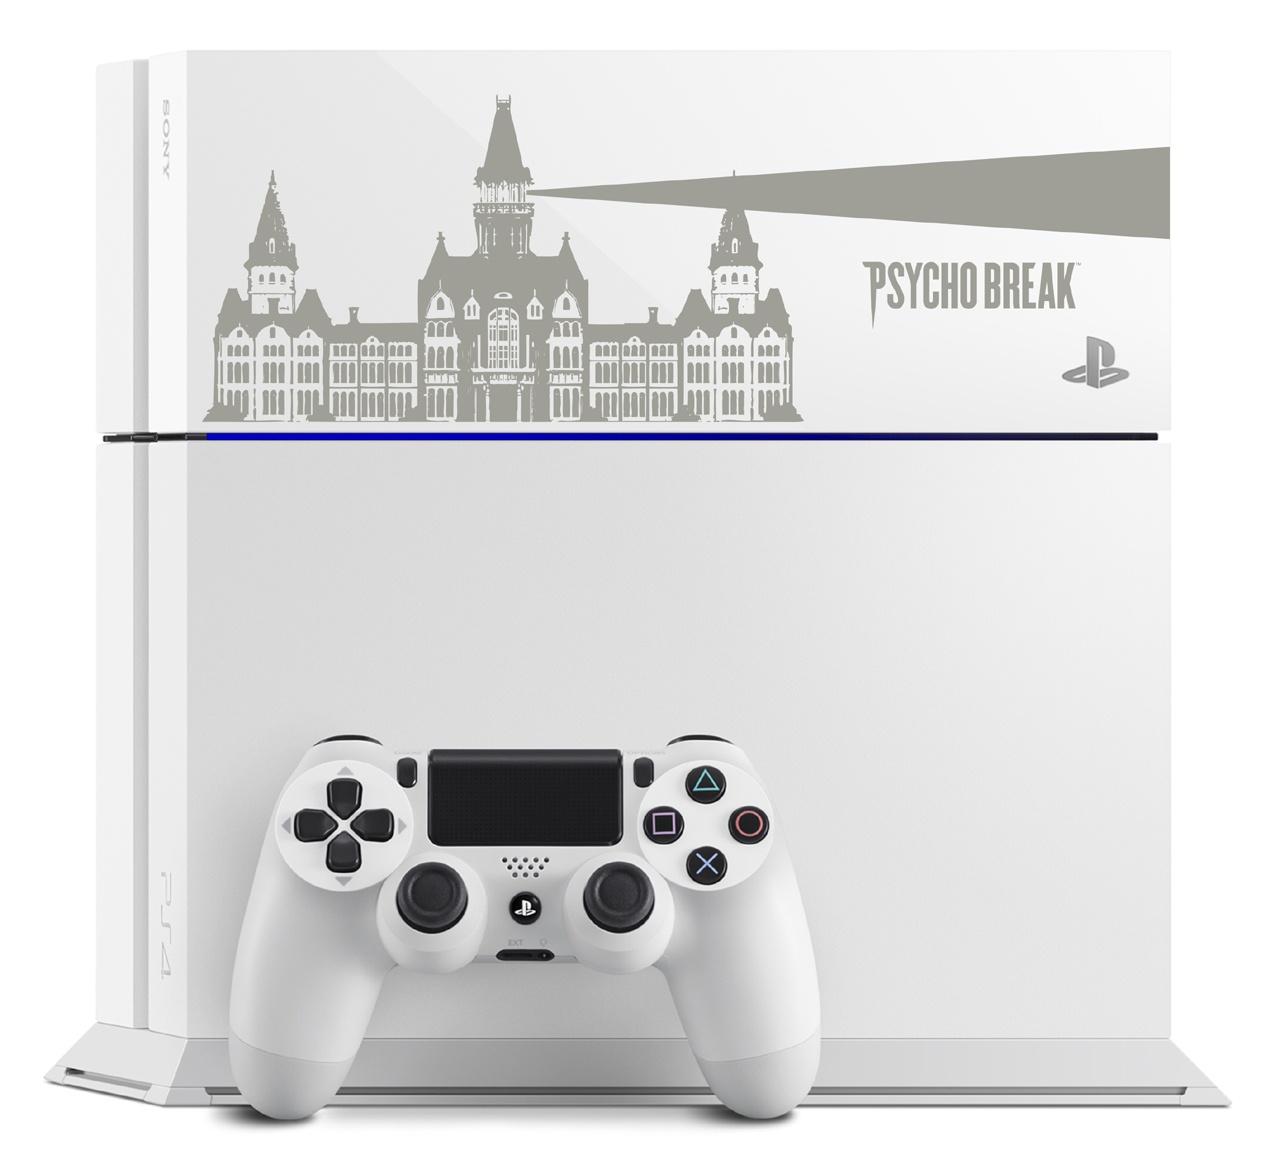 Custom Psycho Break PS4 console